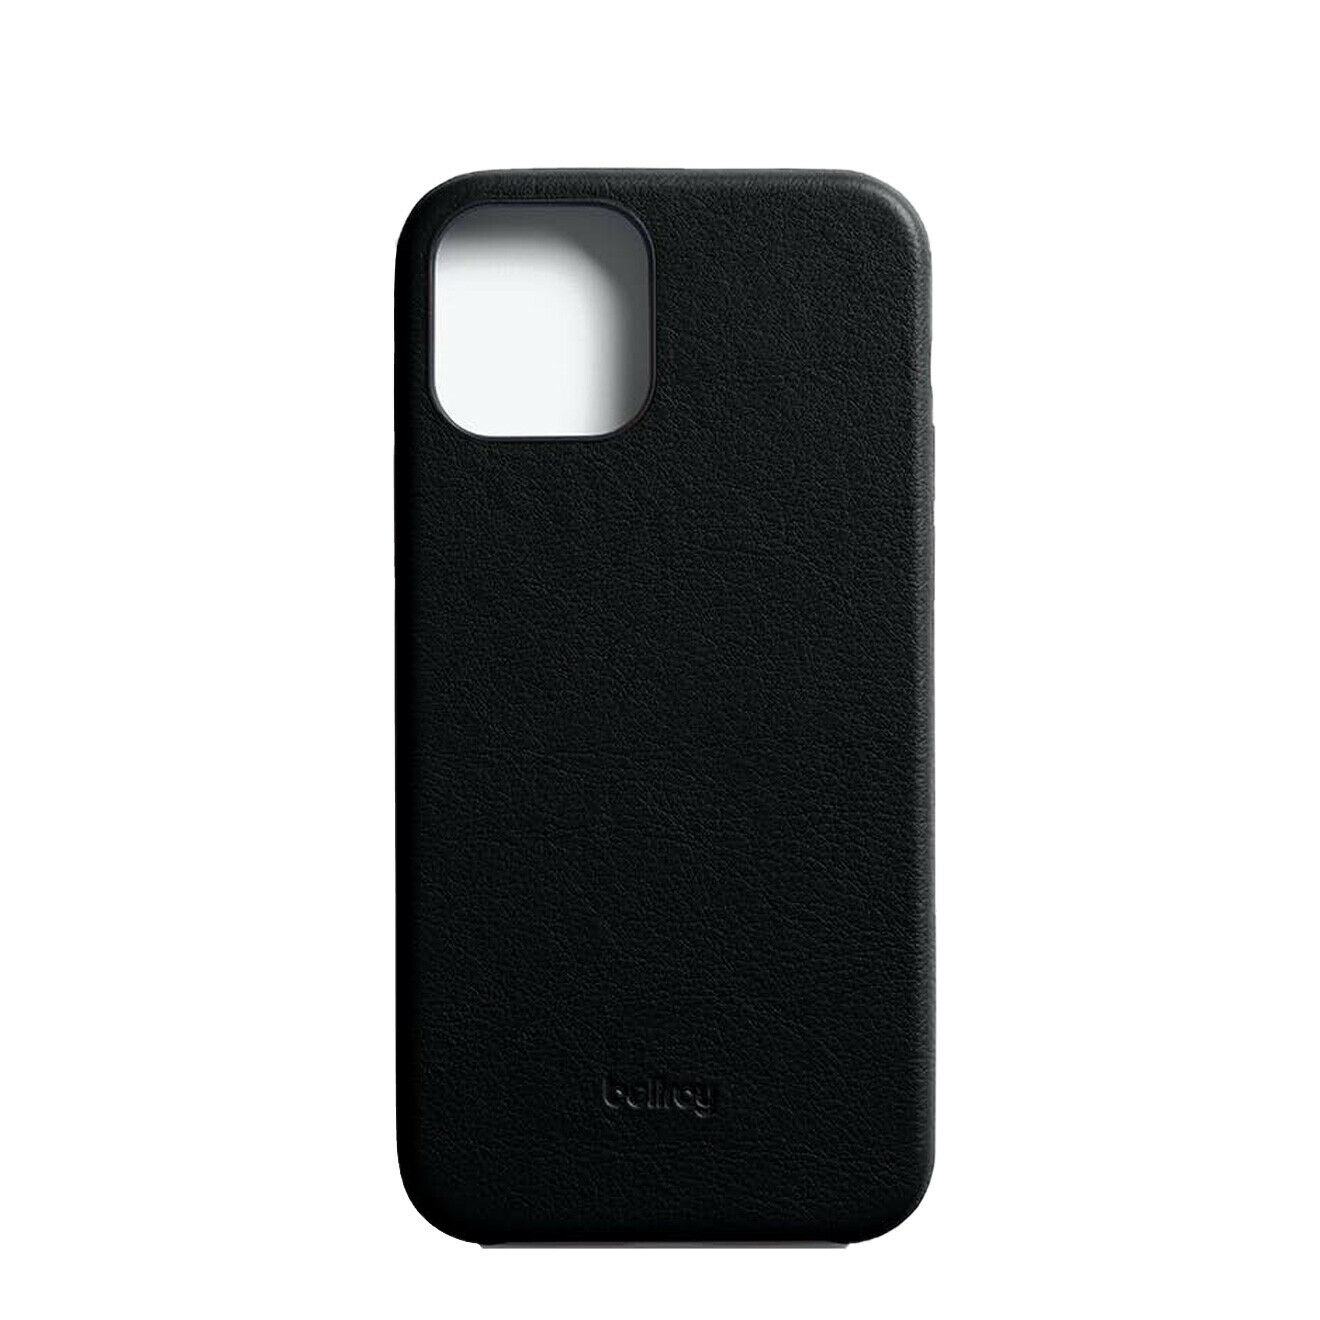 Bellroy iPhone Case 12 / 12 Pro Black - SALE!!